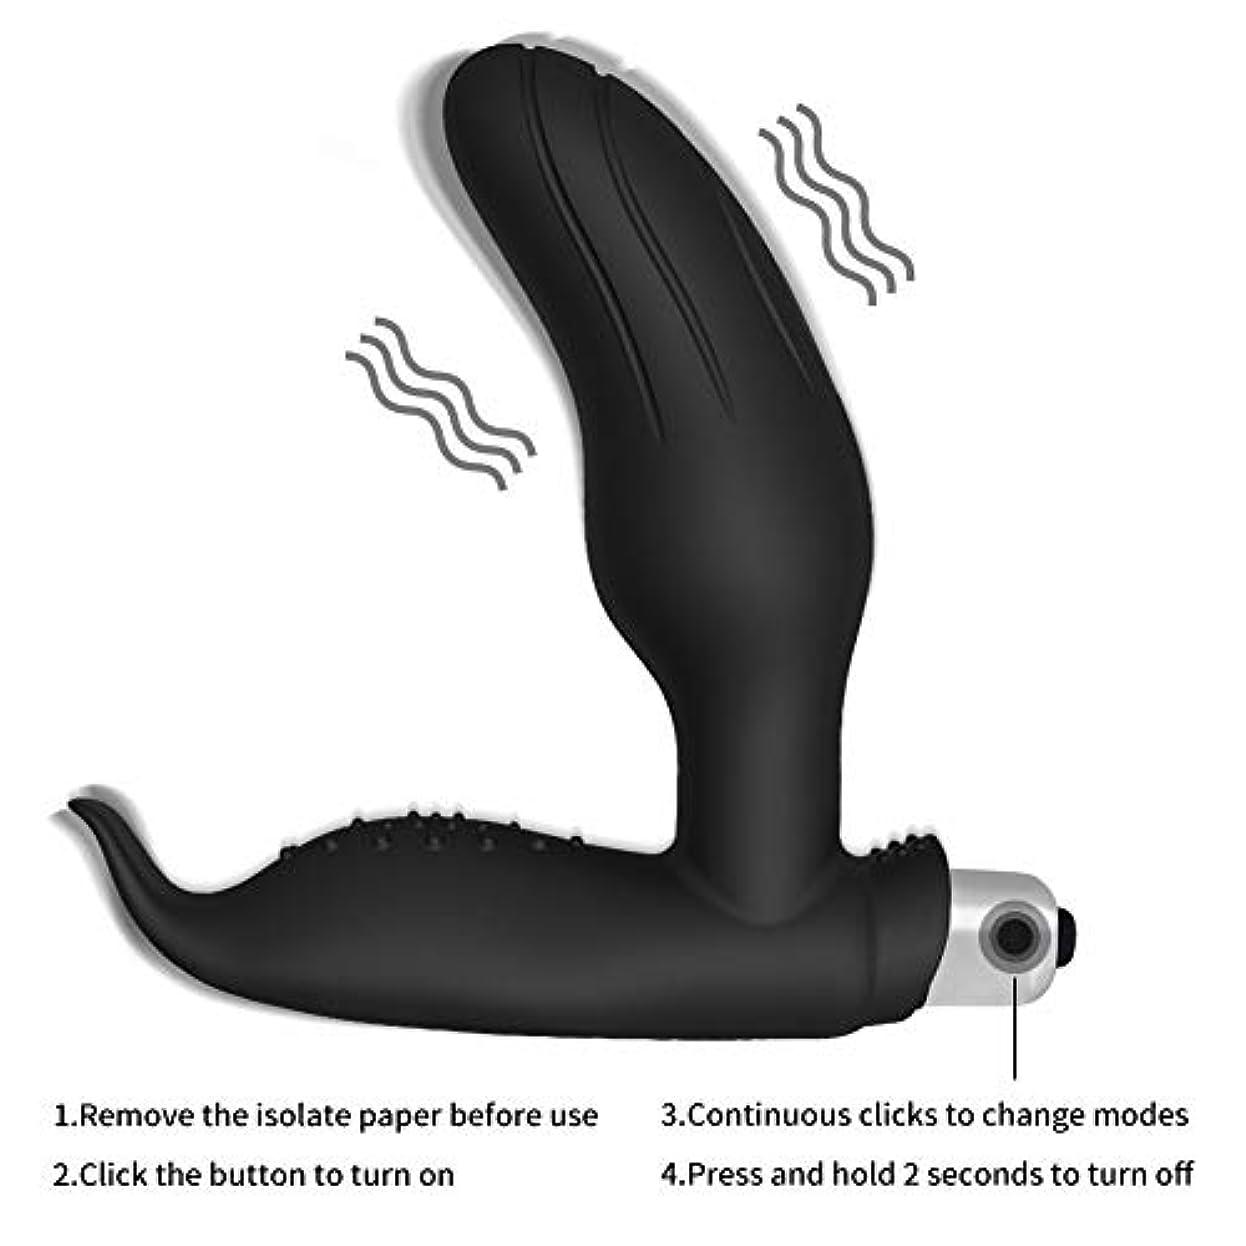 リスキーな密接に不器用NZSZMHS Prostate Massager A-Man Plug用Man G Spot ButtplugVíbrators初心者